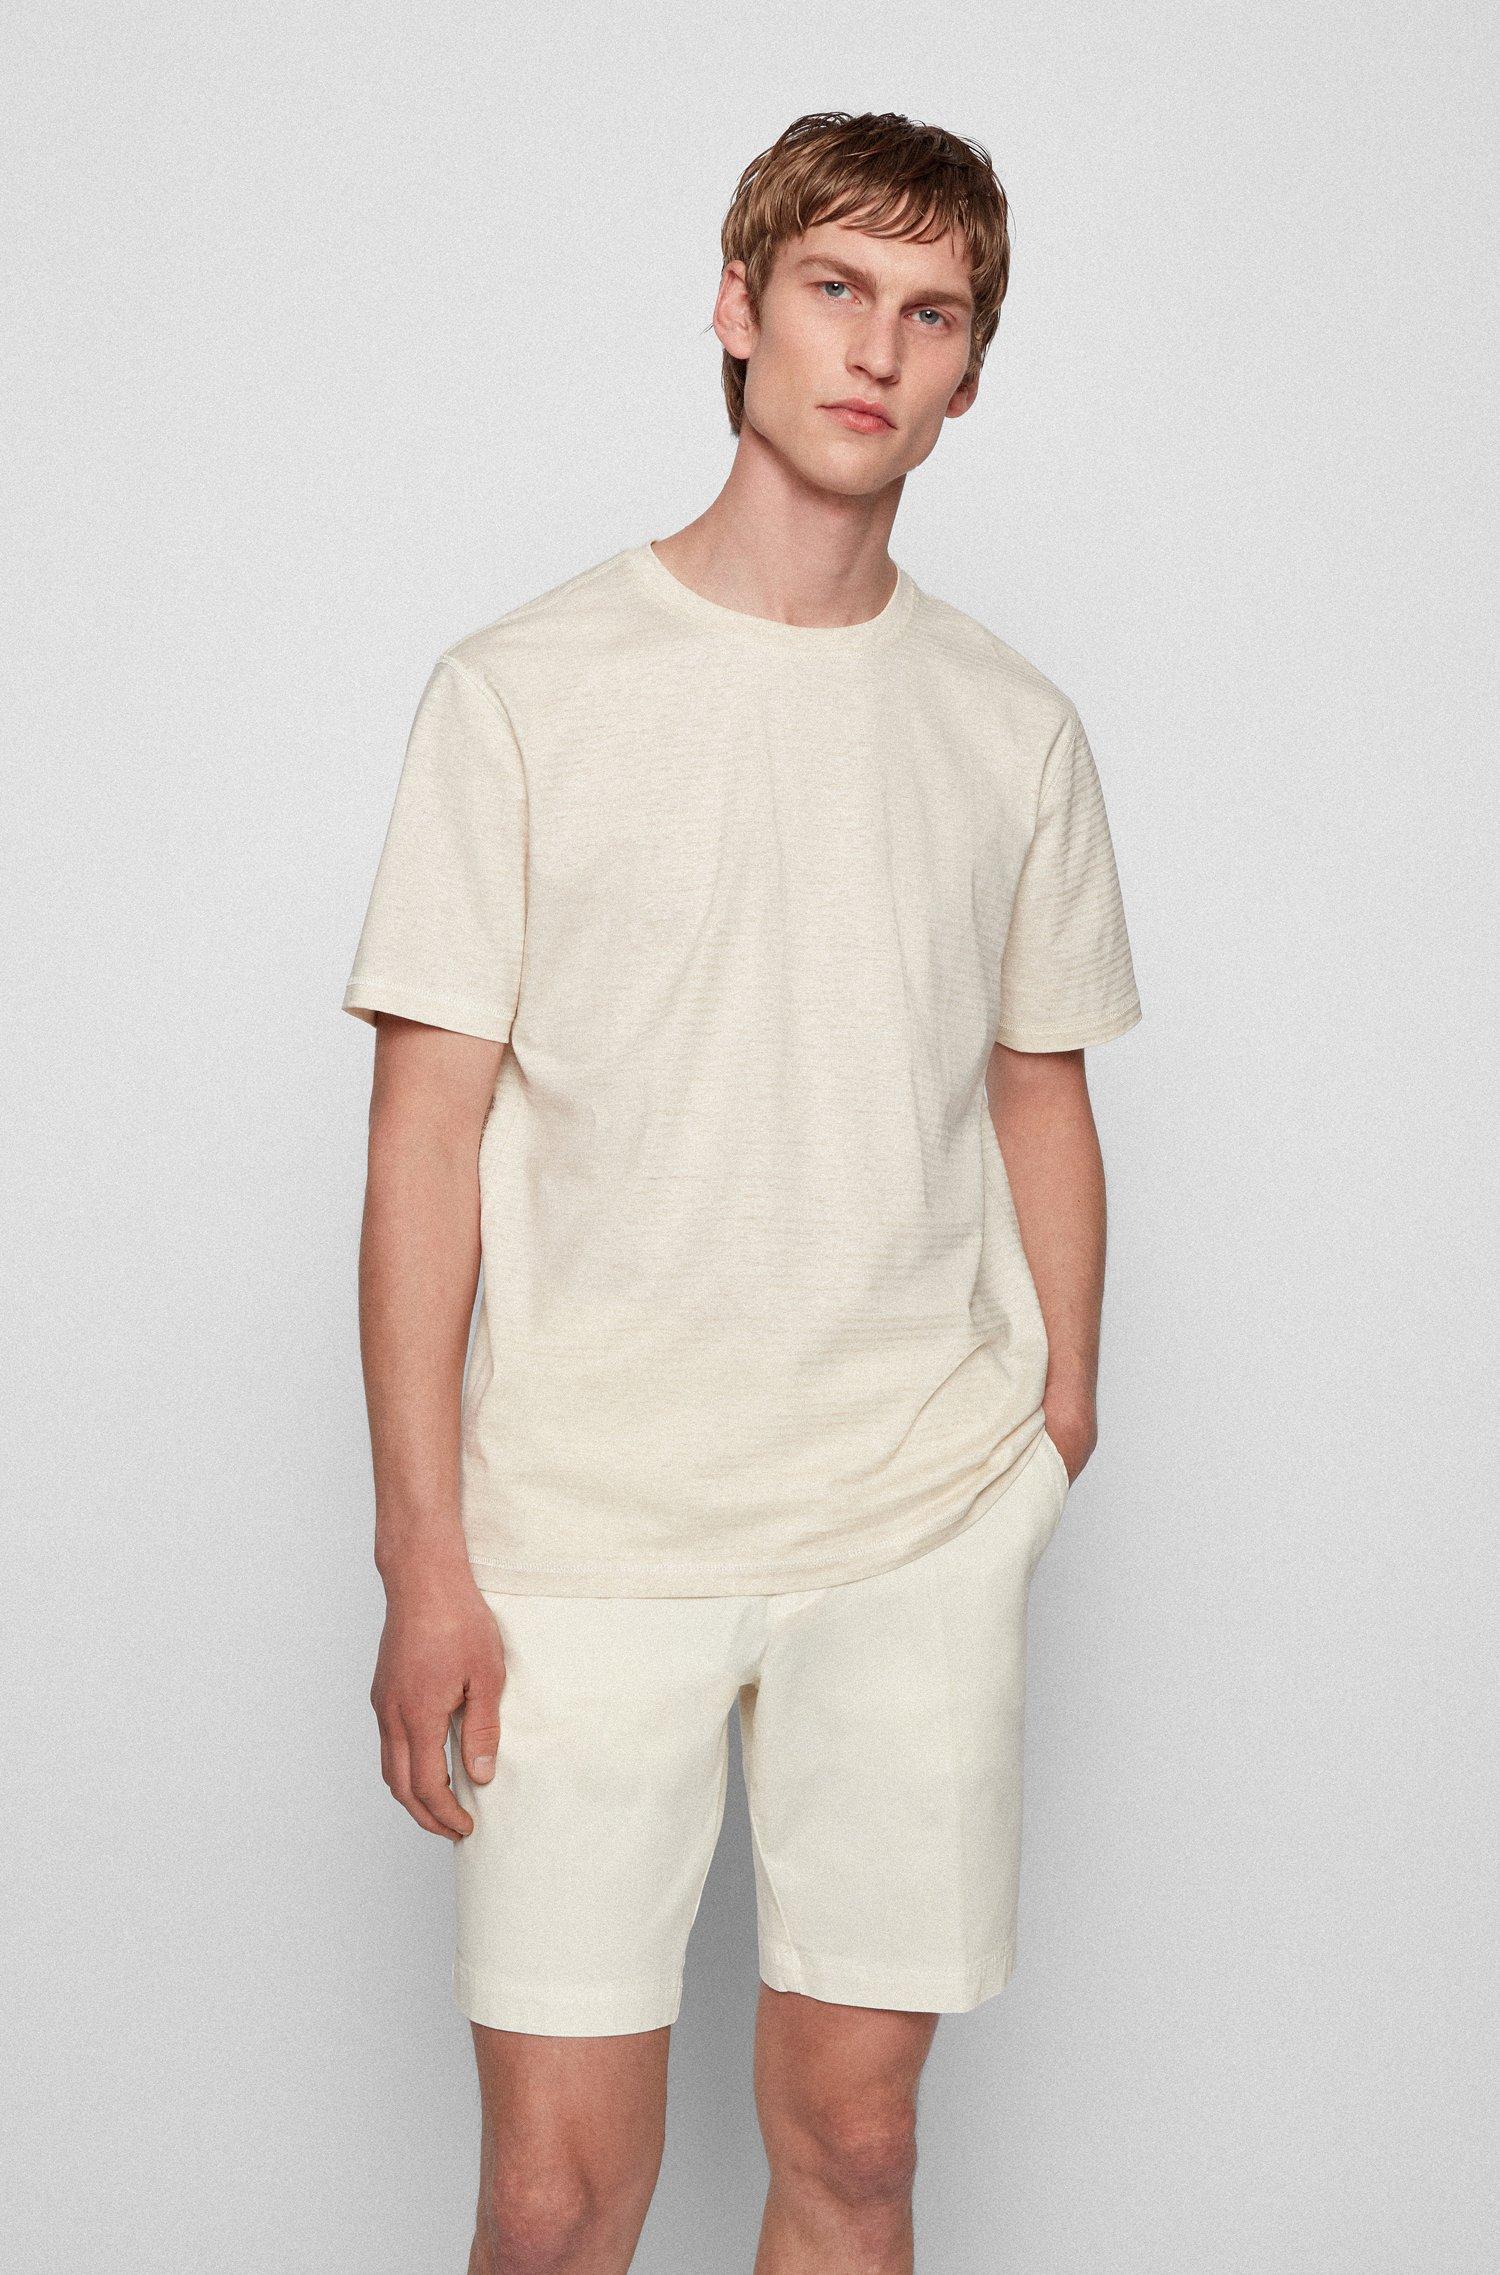 Striped T-shirt in organic cotton and hemp, Light Beige